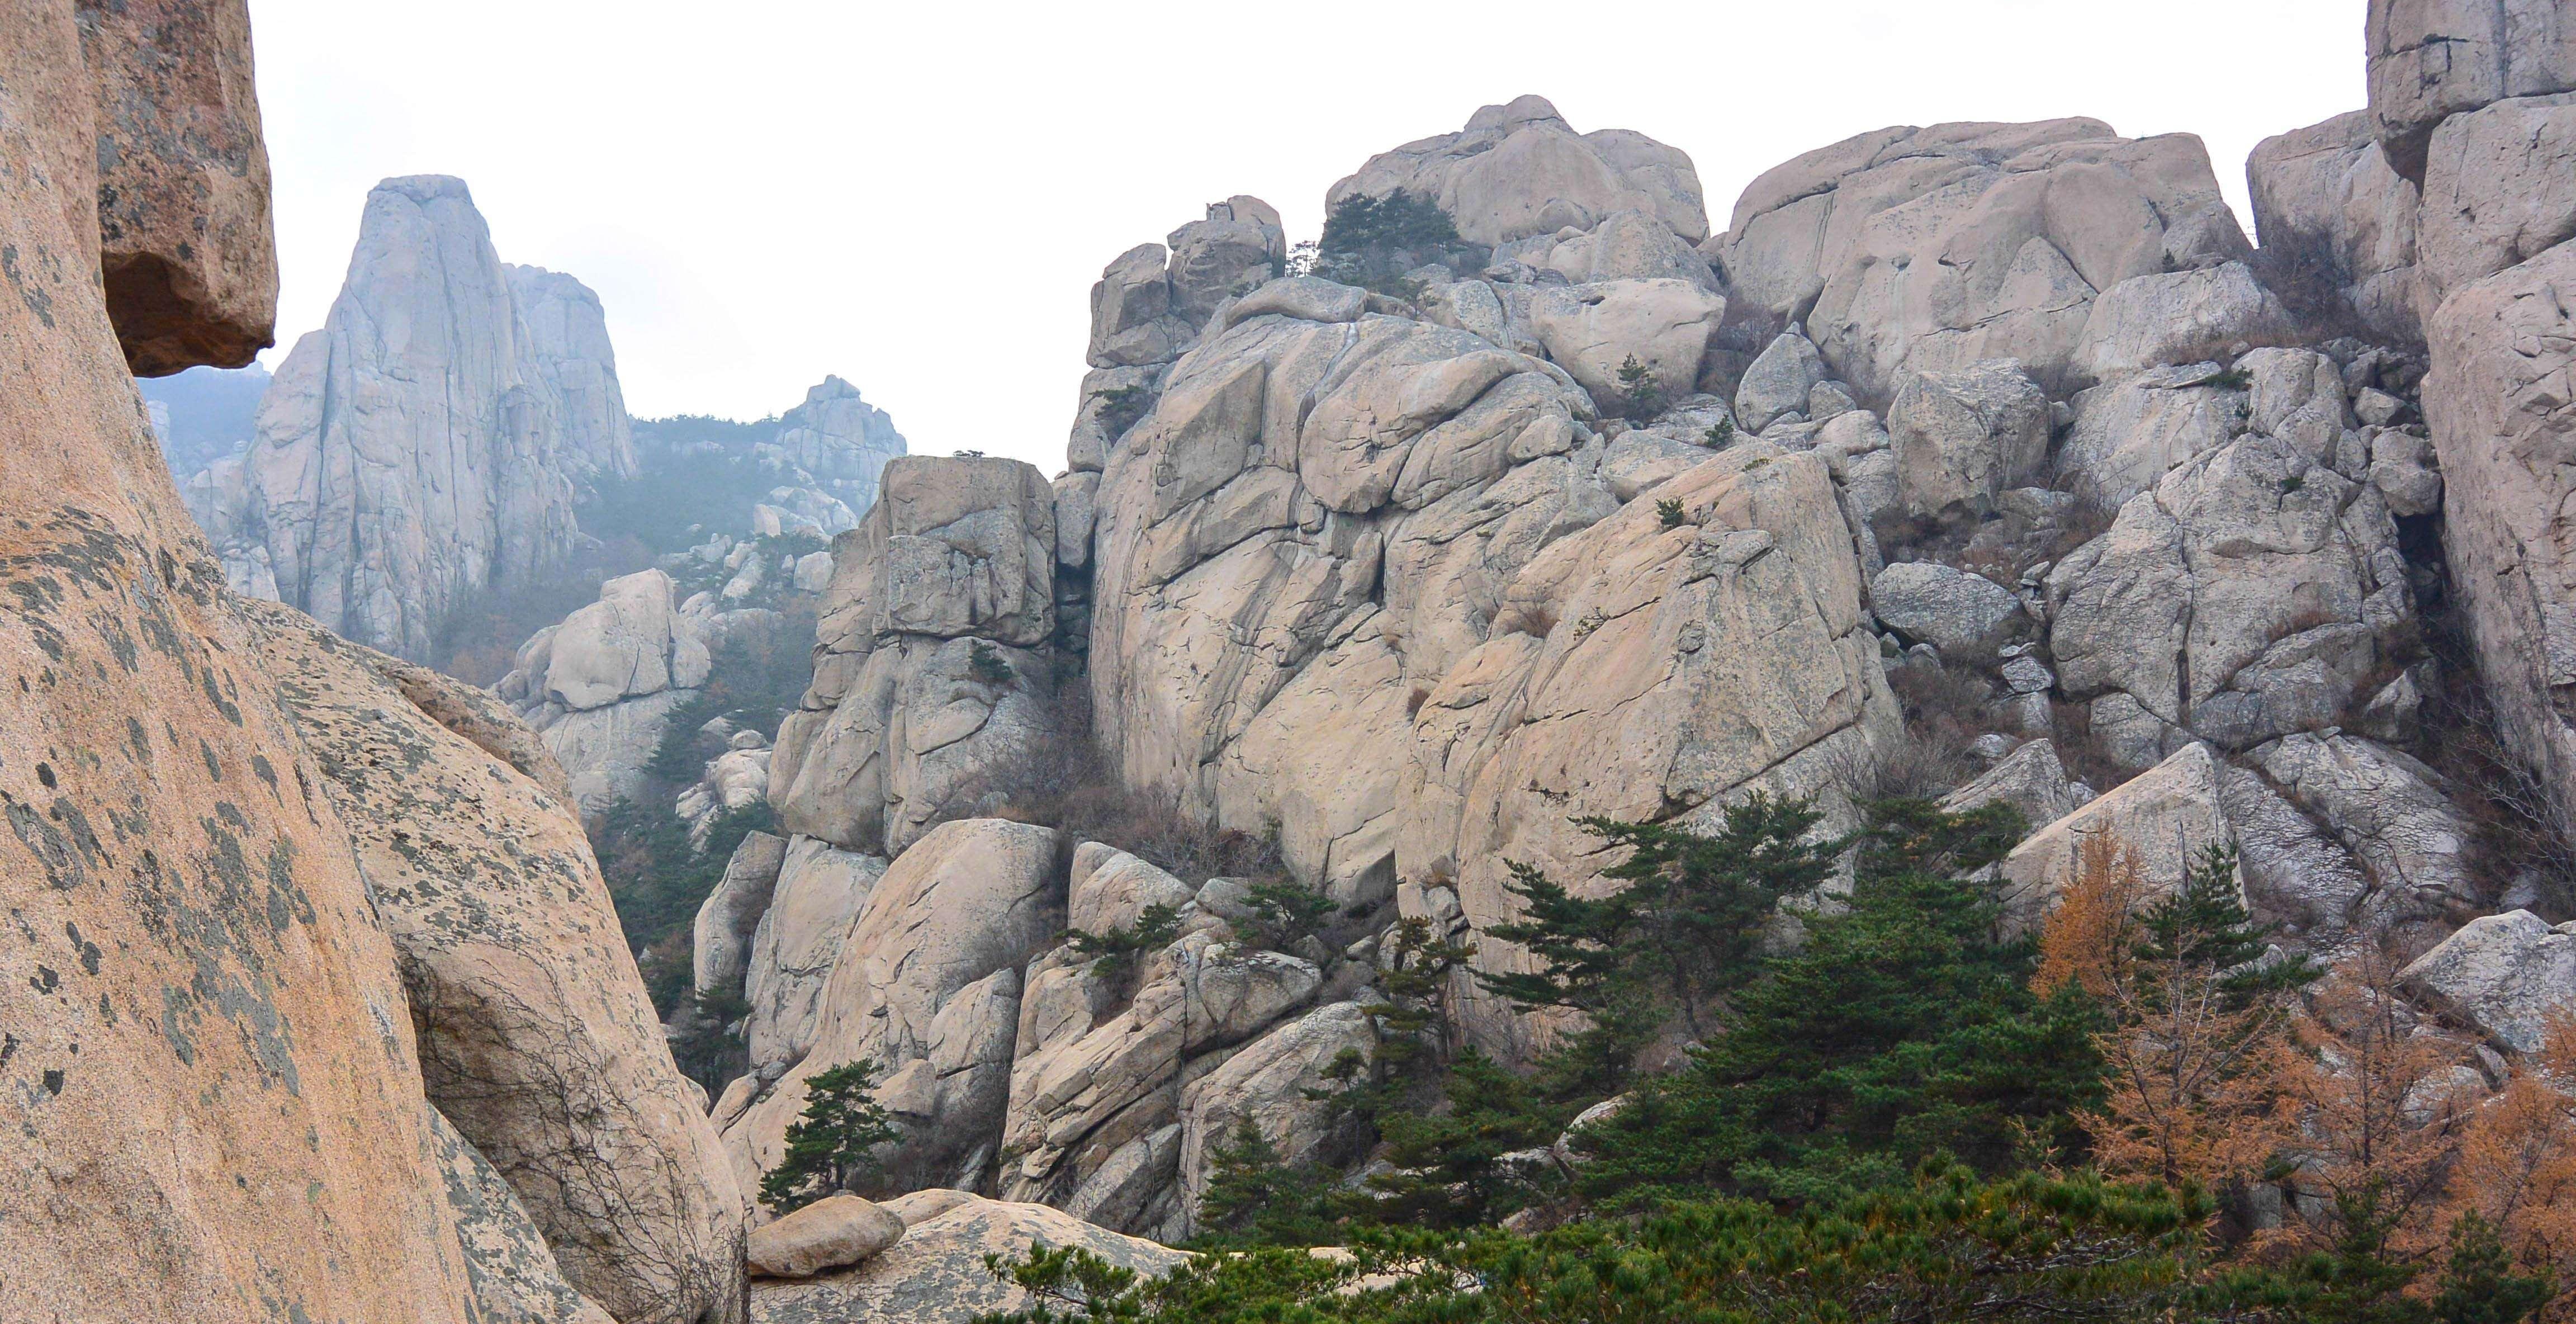 Laoshan's Mountain Peaks